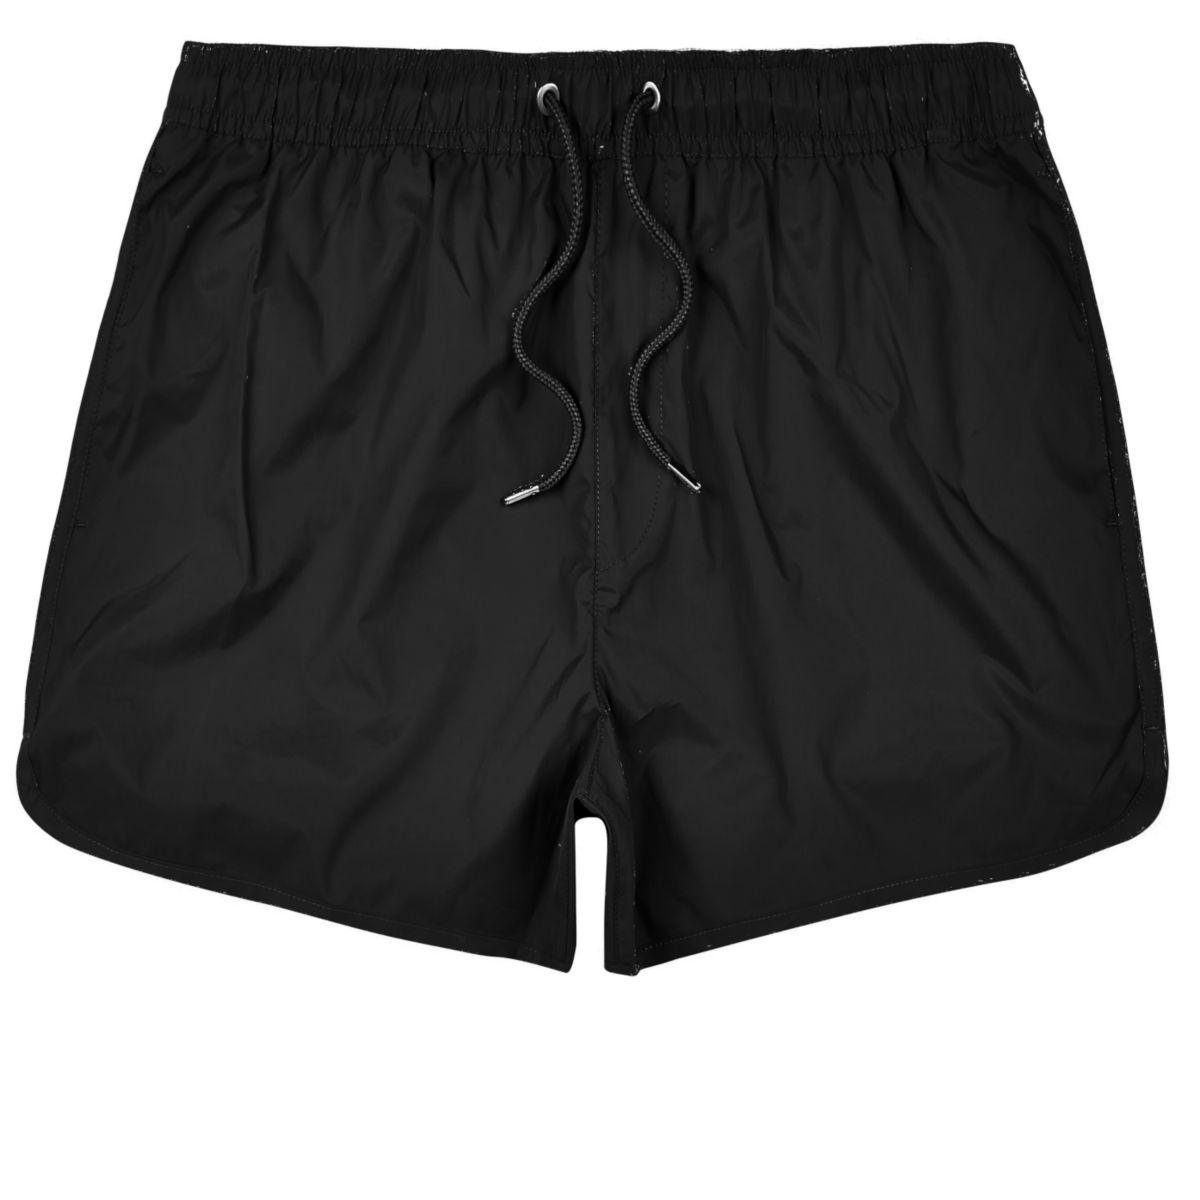 Black plain swim trunks